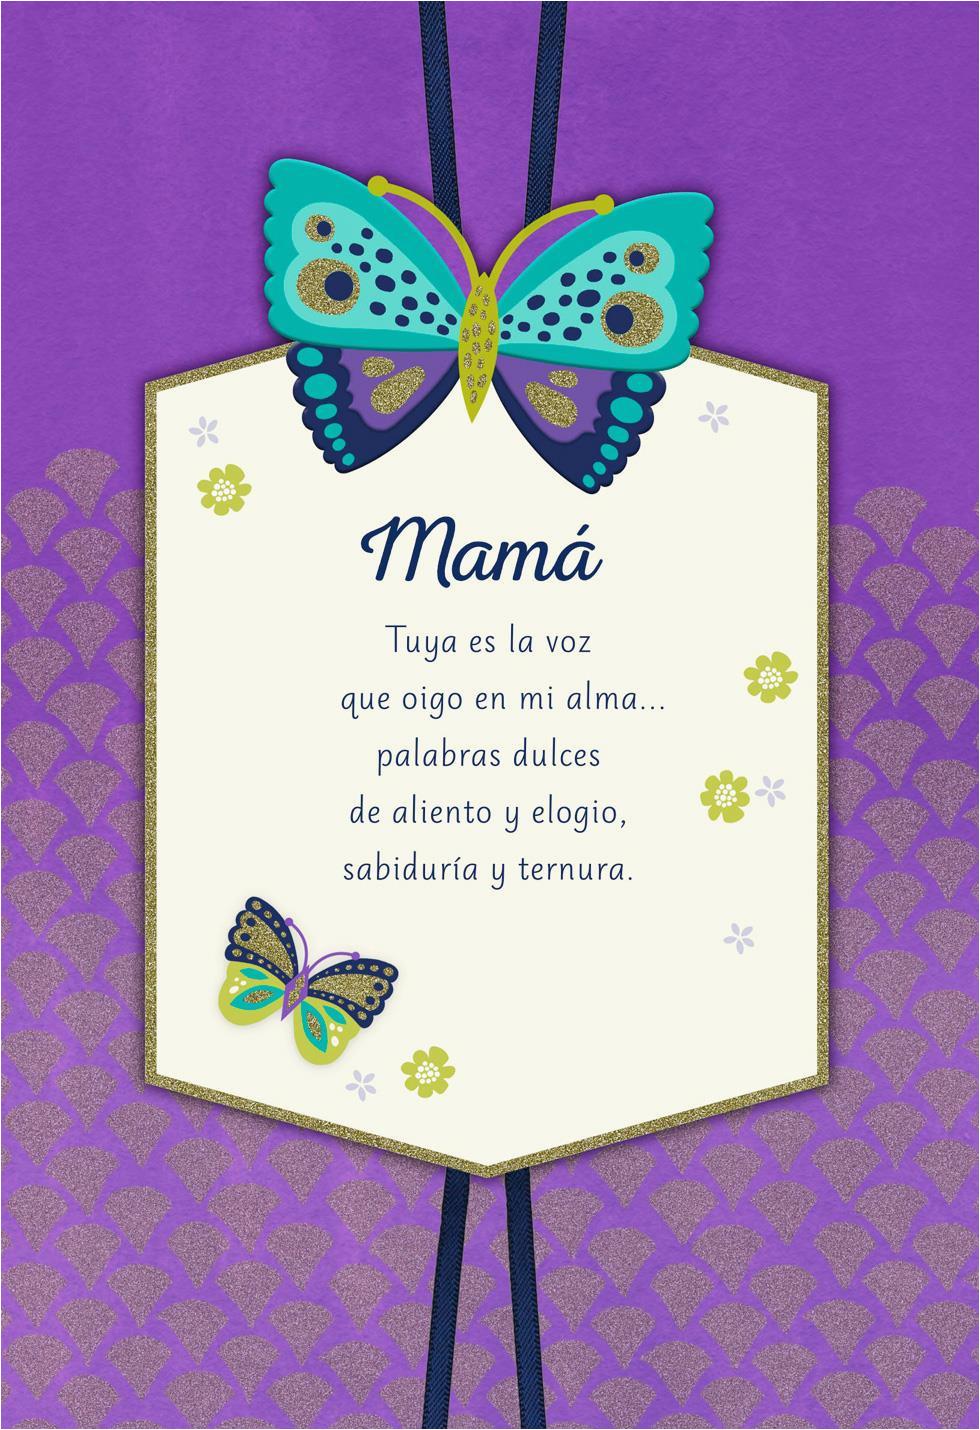 your voice spanish language birthday card for mom 459bif1313